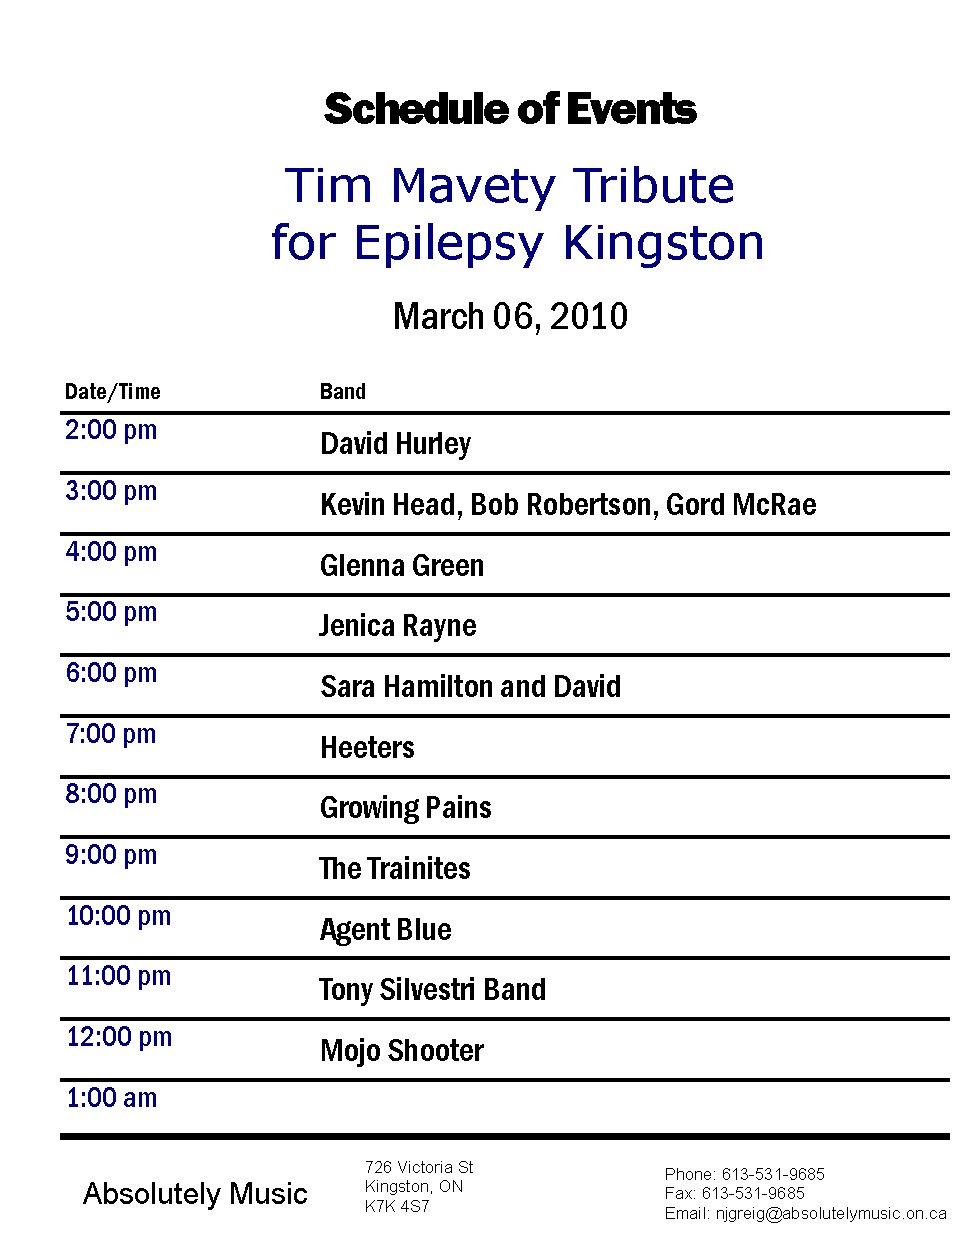 9th Annual Tim Mavety Tribute Schedule